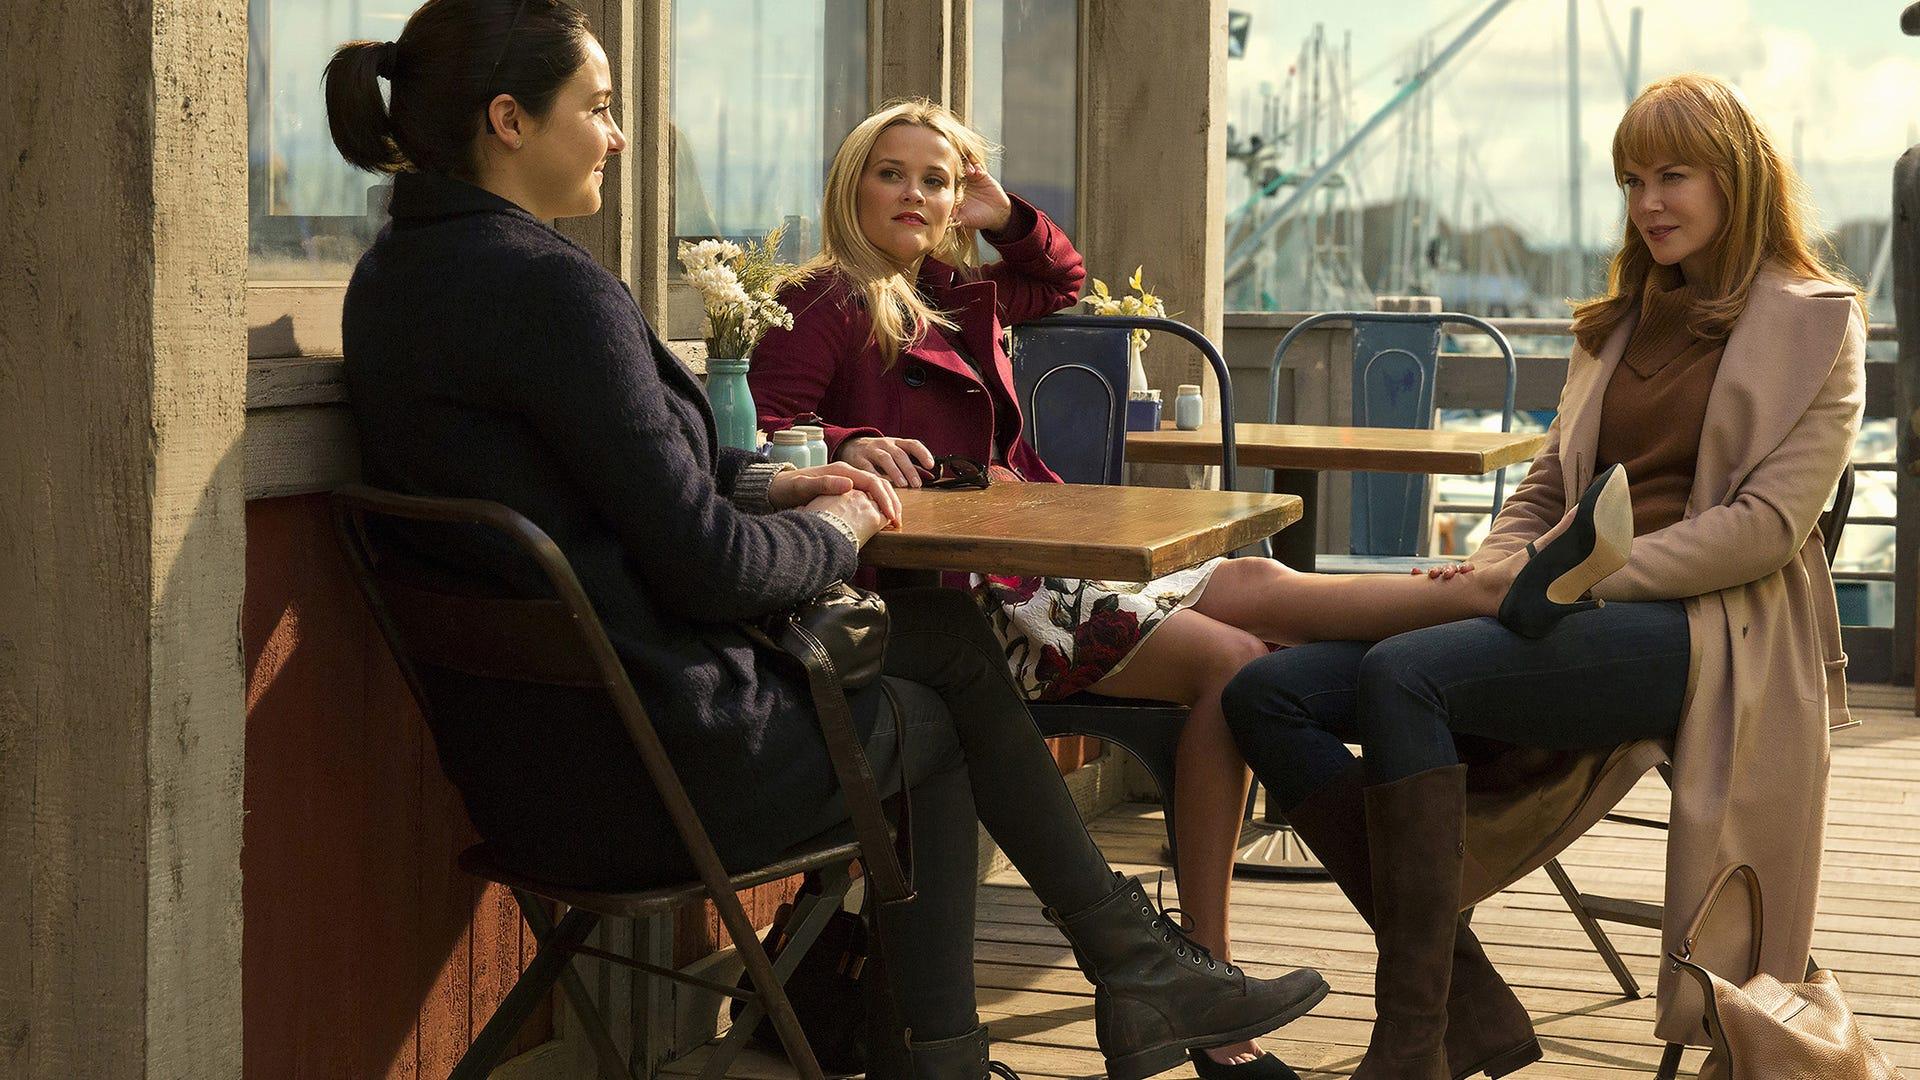 Shailene Woodley, Reese Witherspoon, Nicole Kidman, Big Little Lies